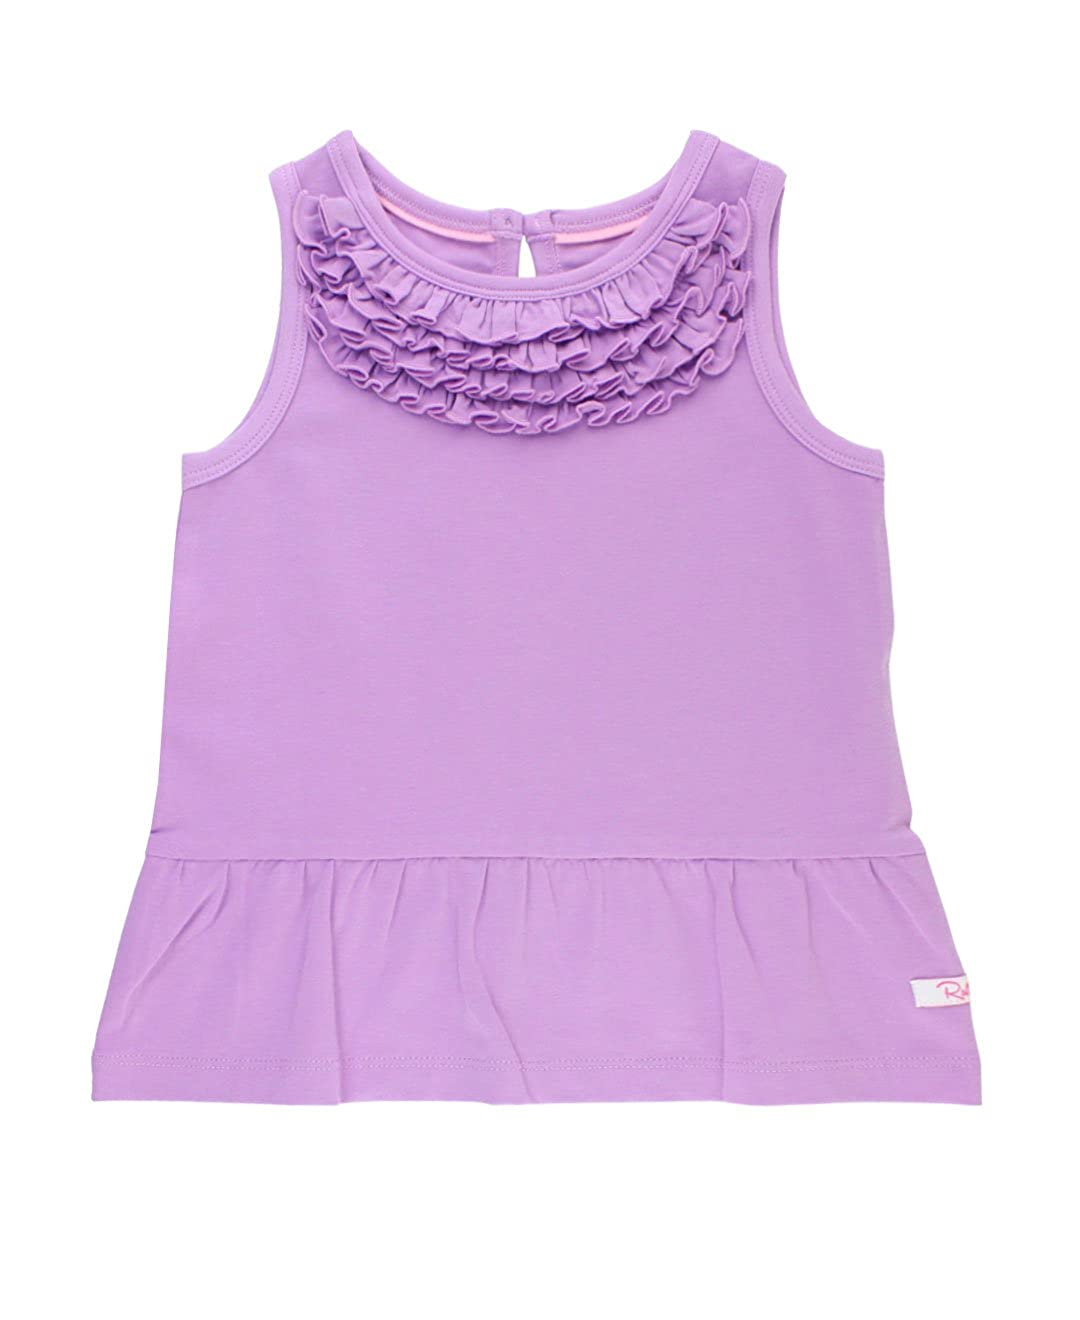 RuffleButts Baby/Toddler Girls Knit Peplum Tank Top TTKYYXX-PEPR-SC-BABY